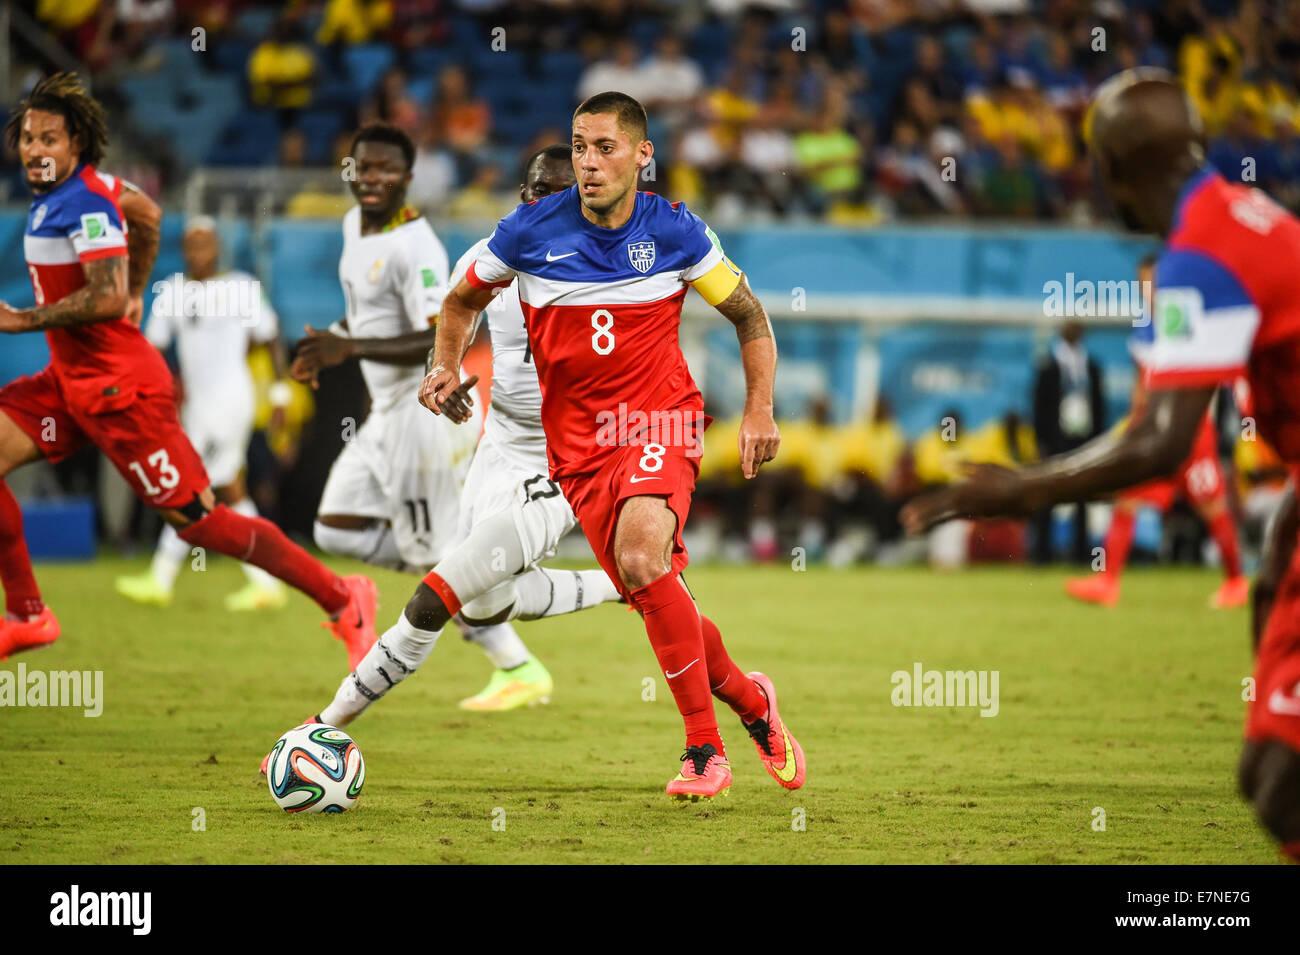 Clint Dempsey of USA. Ghana v USA FIFA World Cup 2014. Natal, Brazil. 16 June 2014 - Stock Image